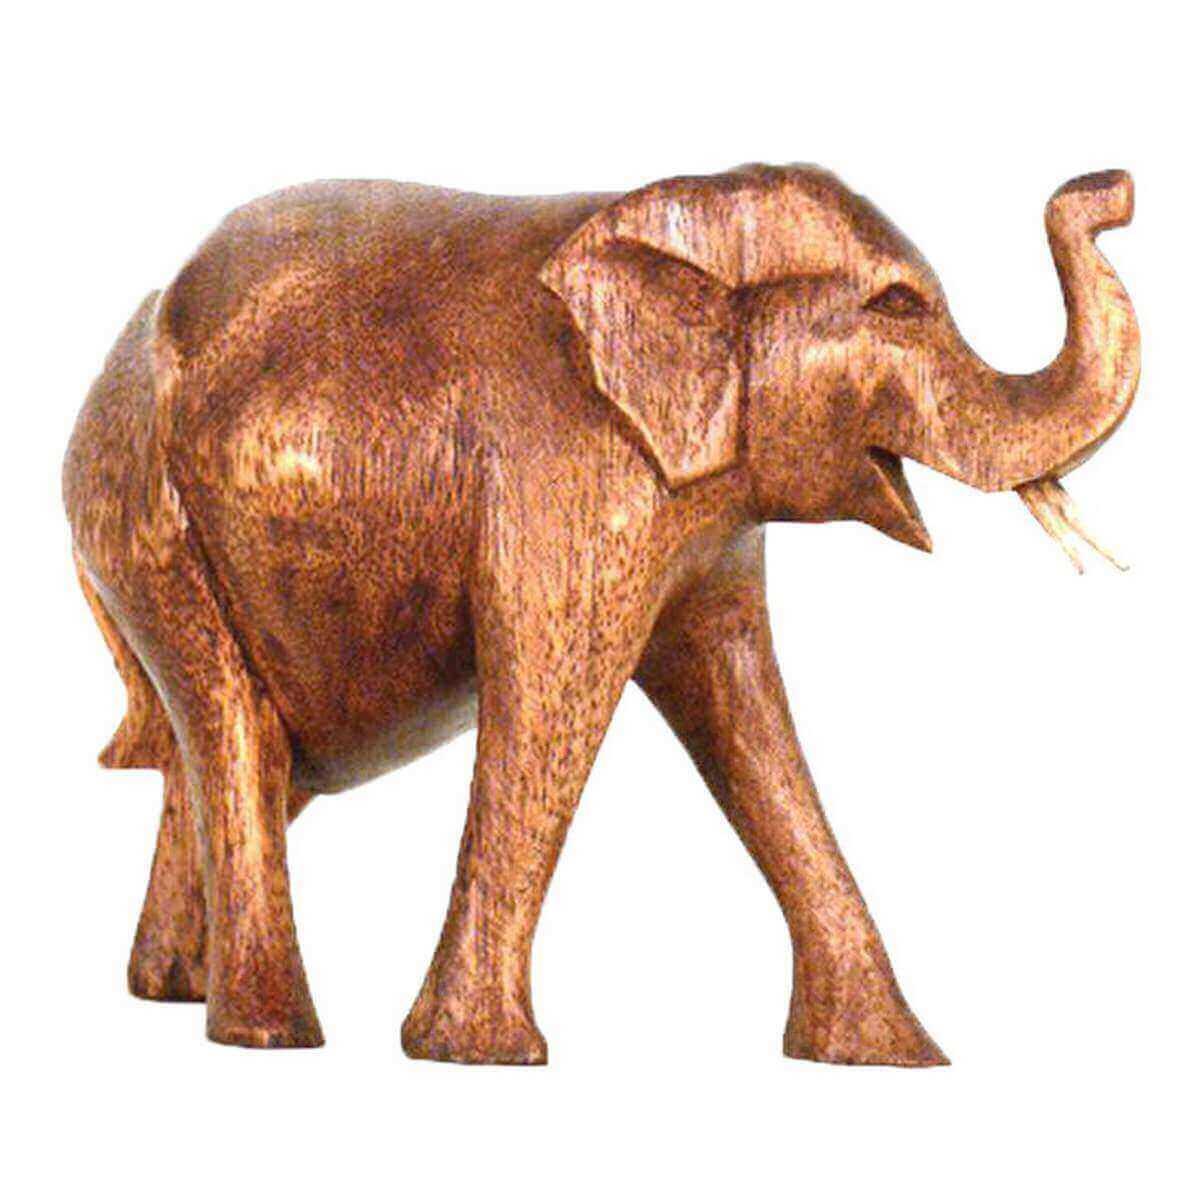 elefant holz figur skulptur abstrakt holzfigur statue afrika asia gluecksbringer handarbeit deko aus skulpturen schnitzerei online simandra shop de 2